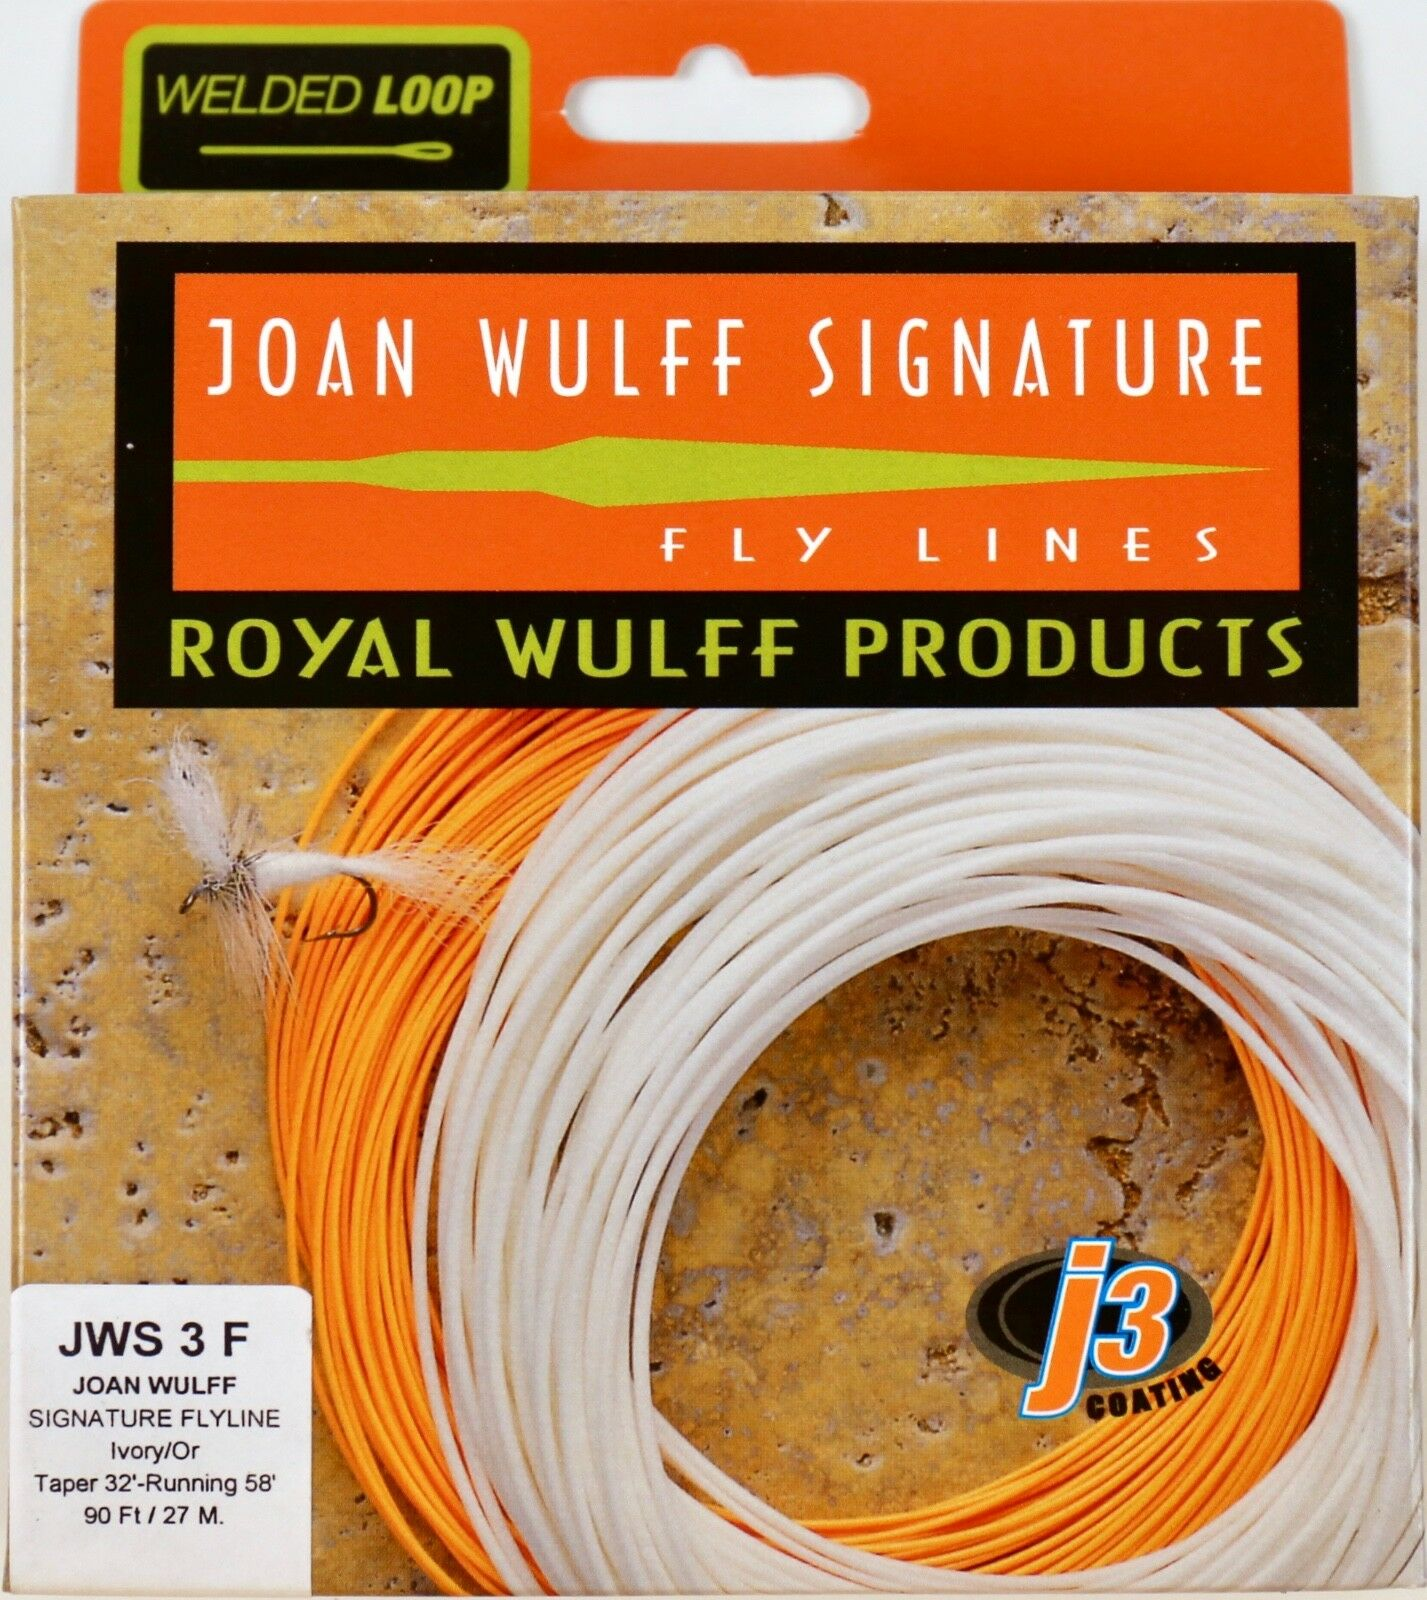 Royal Wulff Joan Wulff Signature 3 WT Floating Fly Line Free Shipping JWS3F